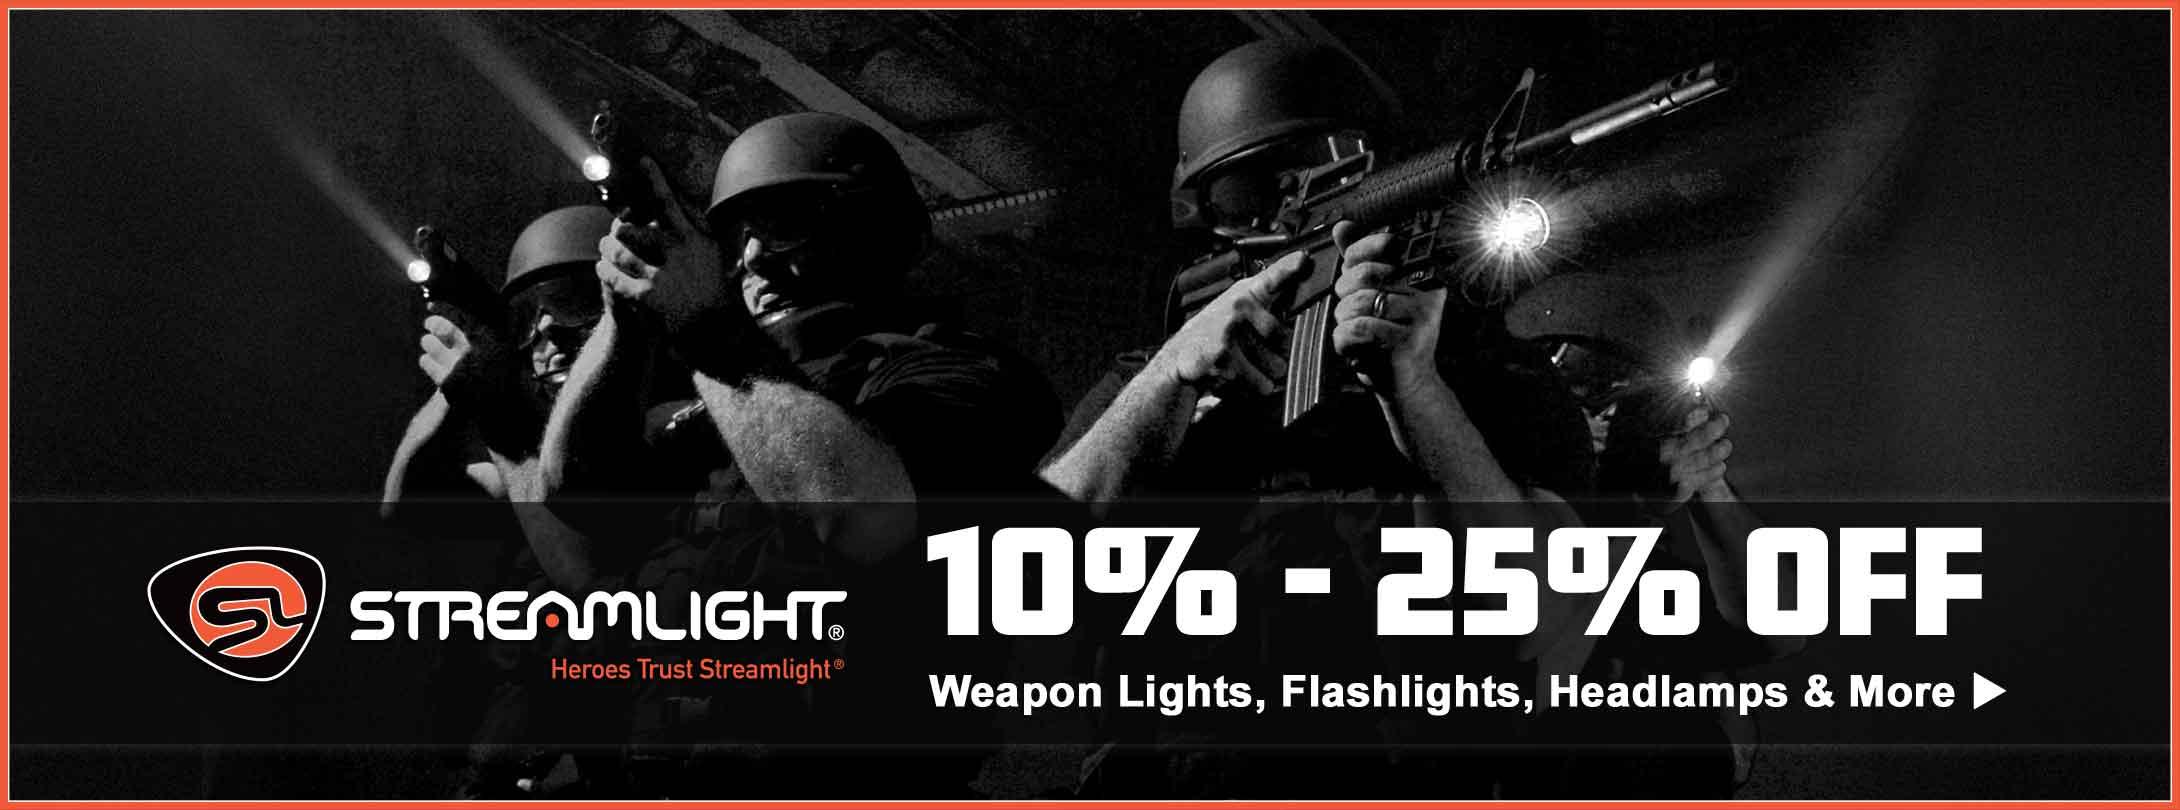 10% - 25% Off Streamlight Weapon Lights, Flashlights & More!